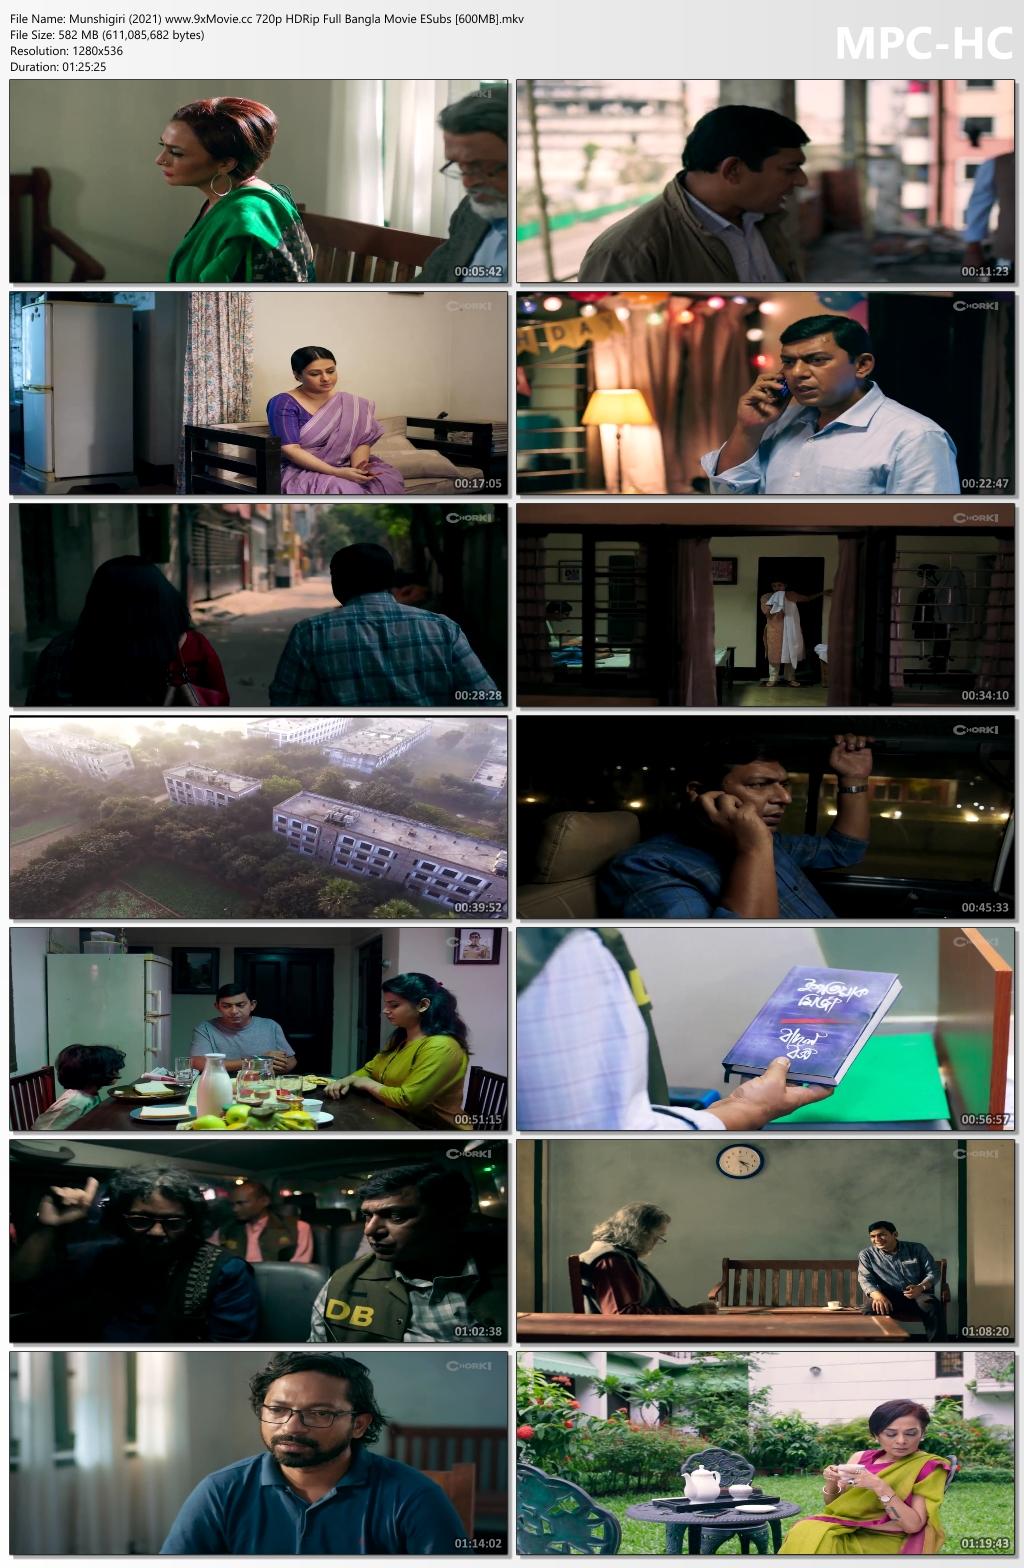 Munshigiri-2021-www-9x-Movie-cc-720p-HDRip-Full-Bangla-Movie-ESubs-600-MB-mkv